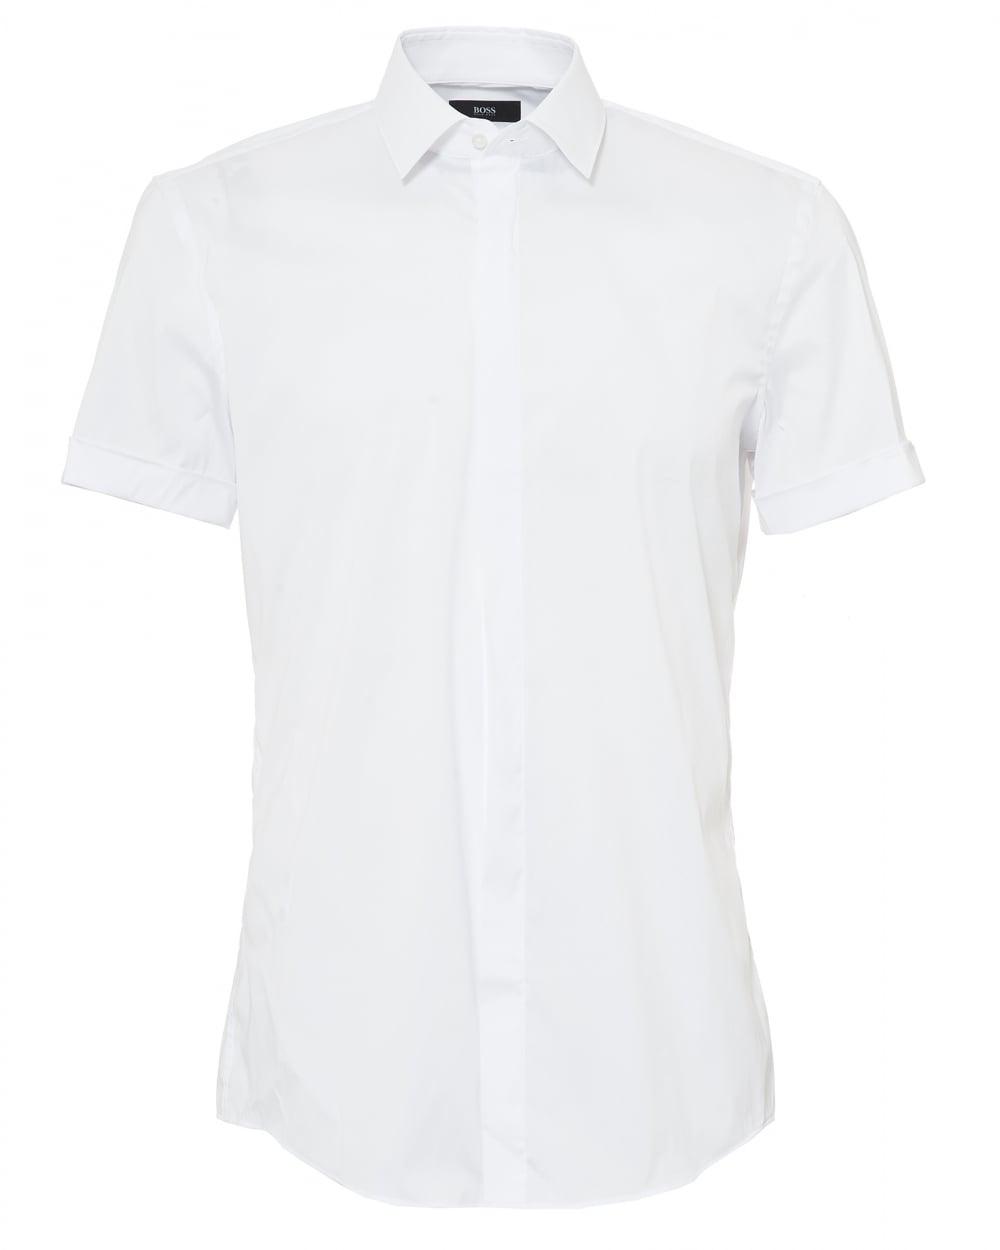 Mens Jill Shirt, Short Sleeved Slim Fit White Shirt